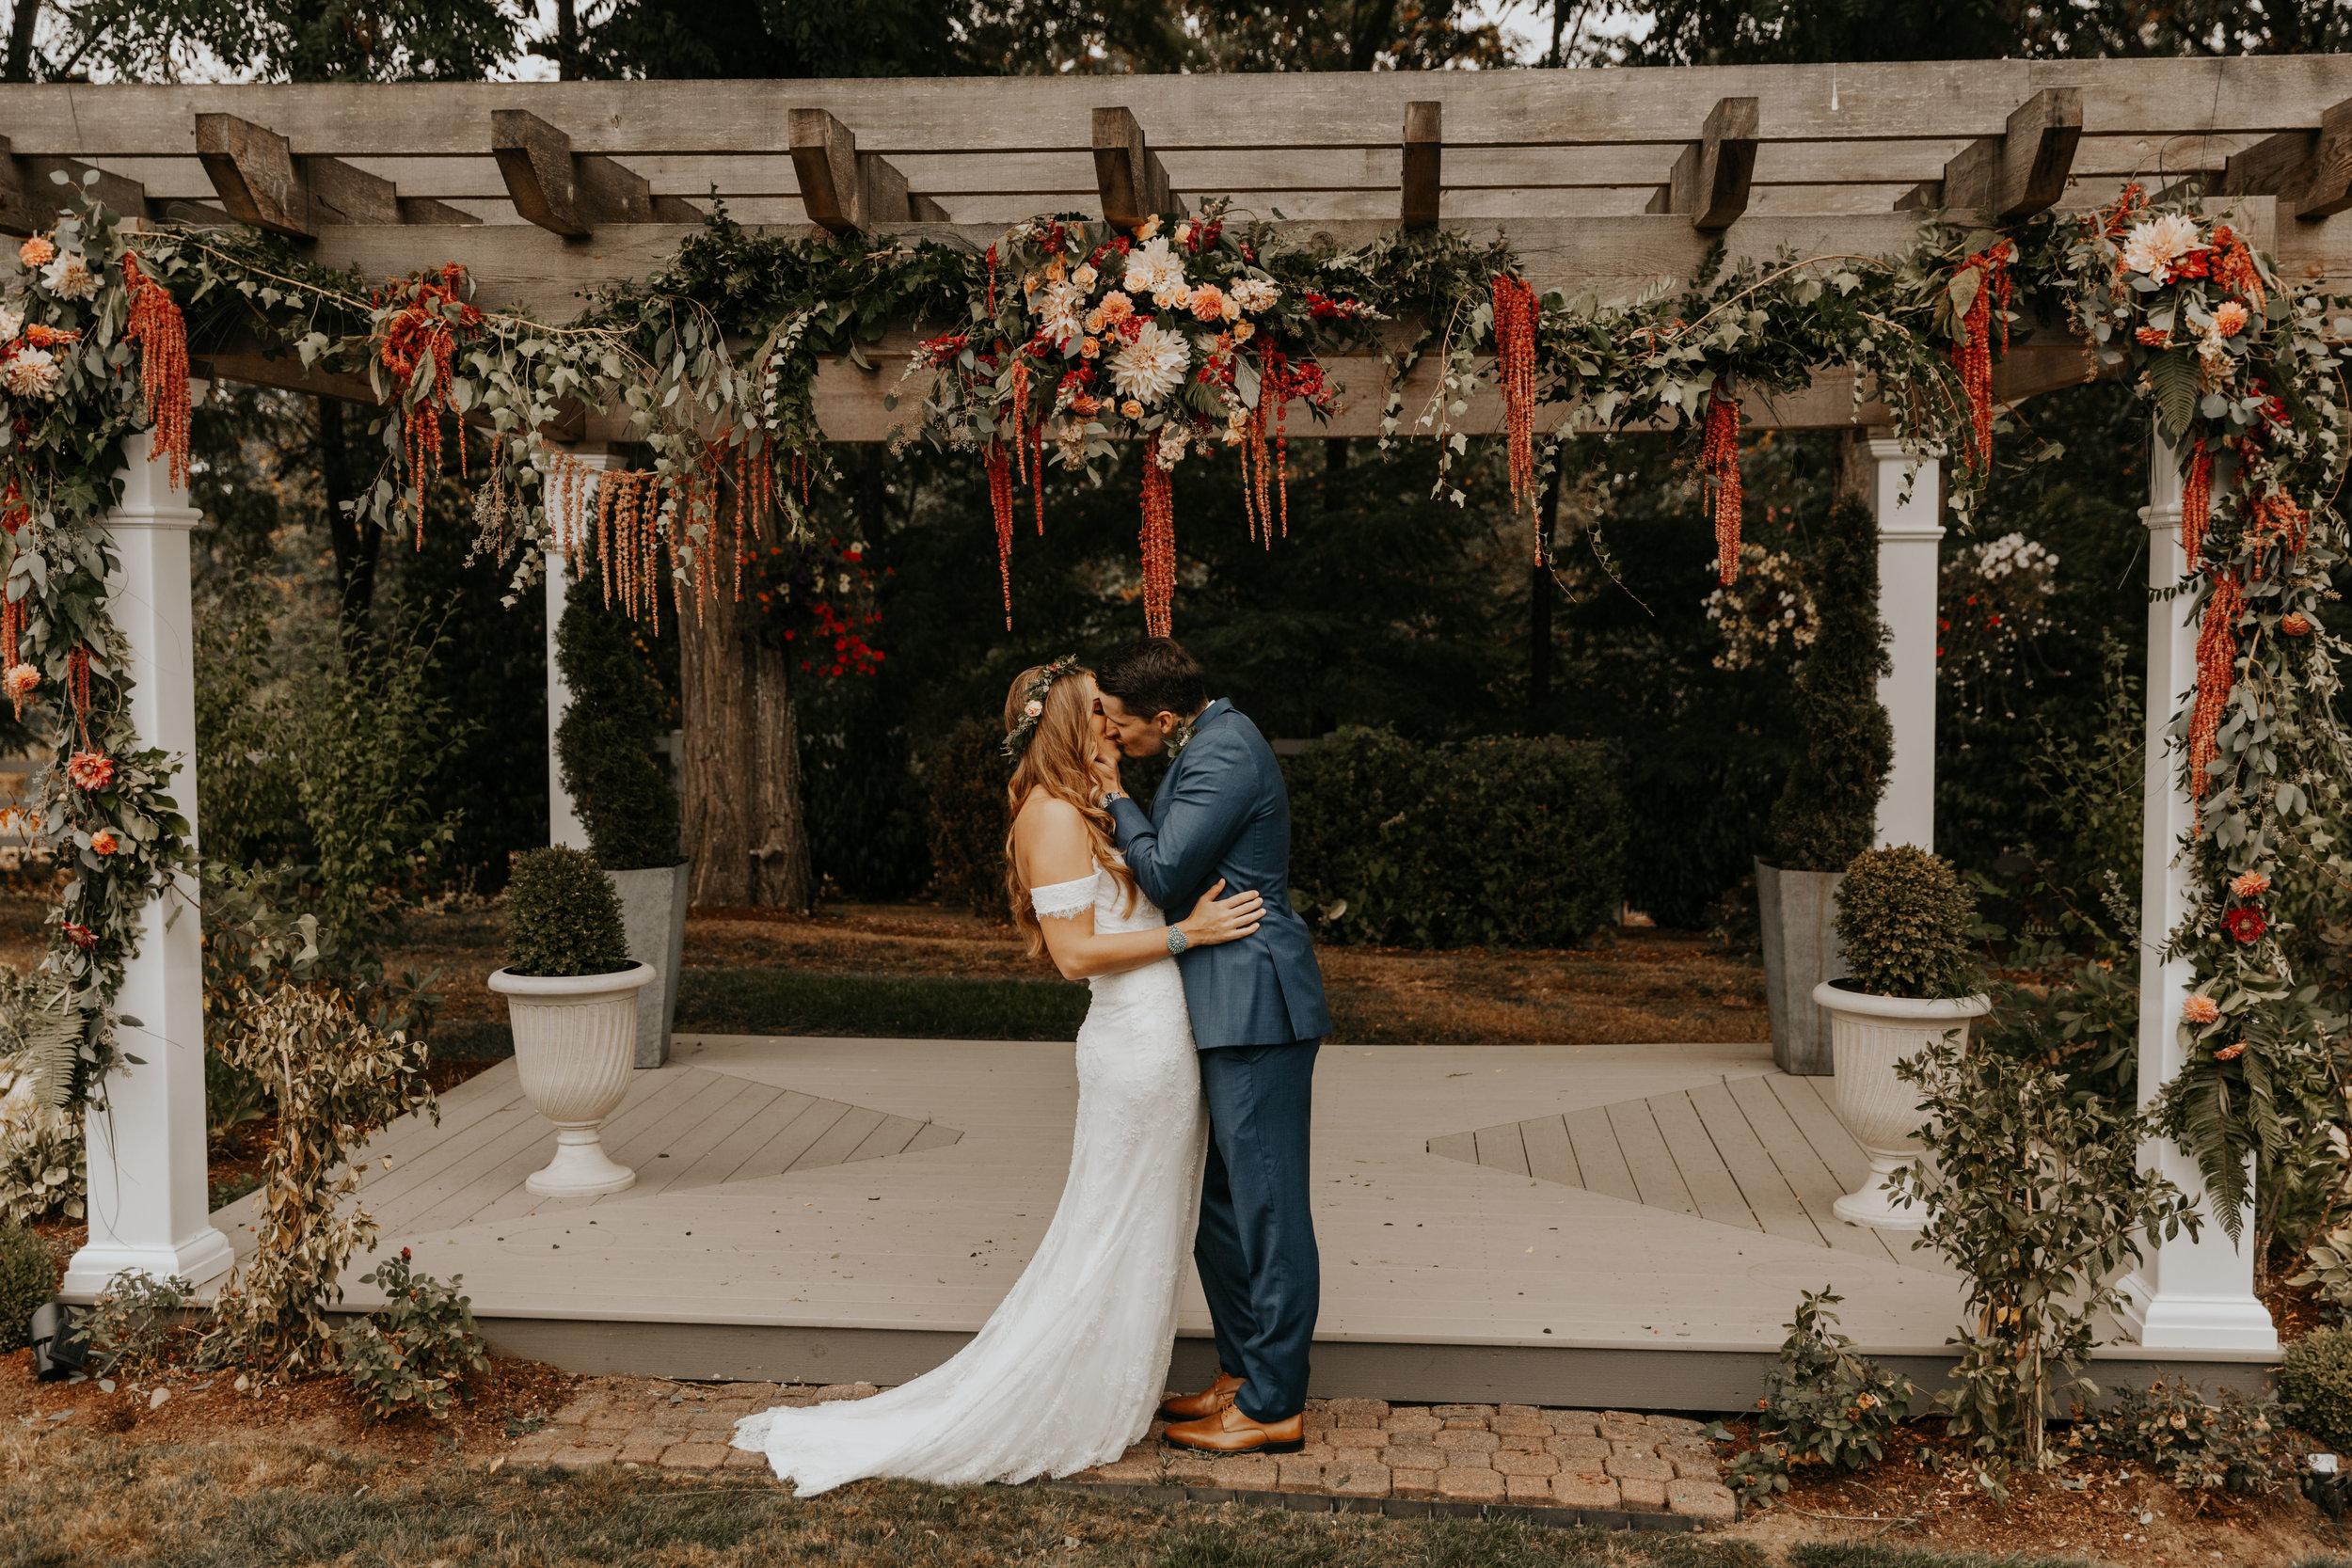 ginapaulson_jakitrevor_wedding-214.jpg